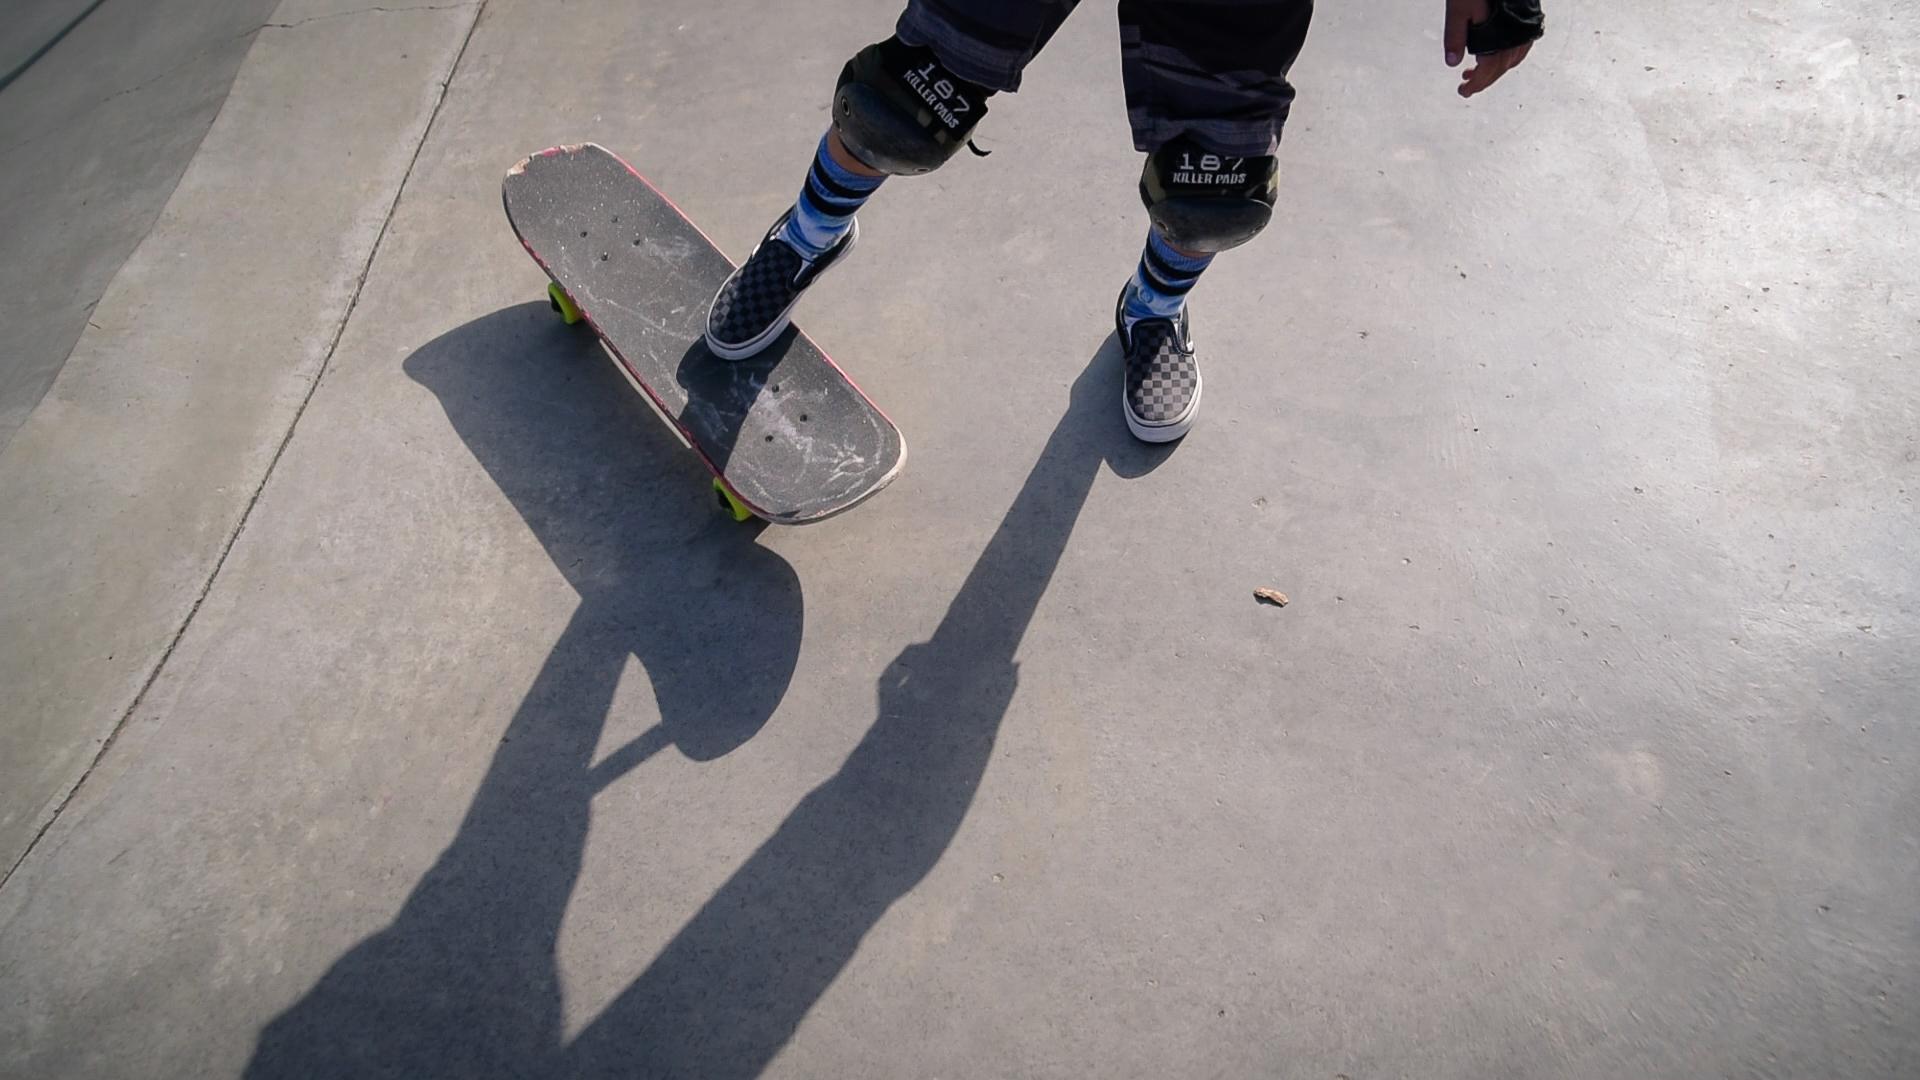 young boy's feet on skateboard by springfield illinois photographer lydia stuemke